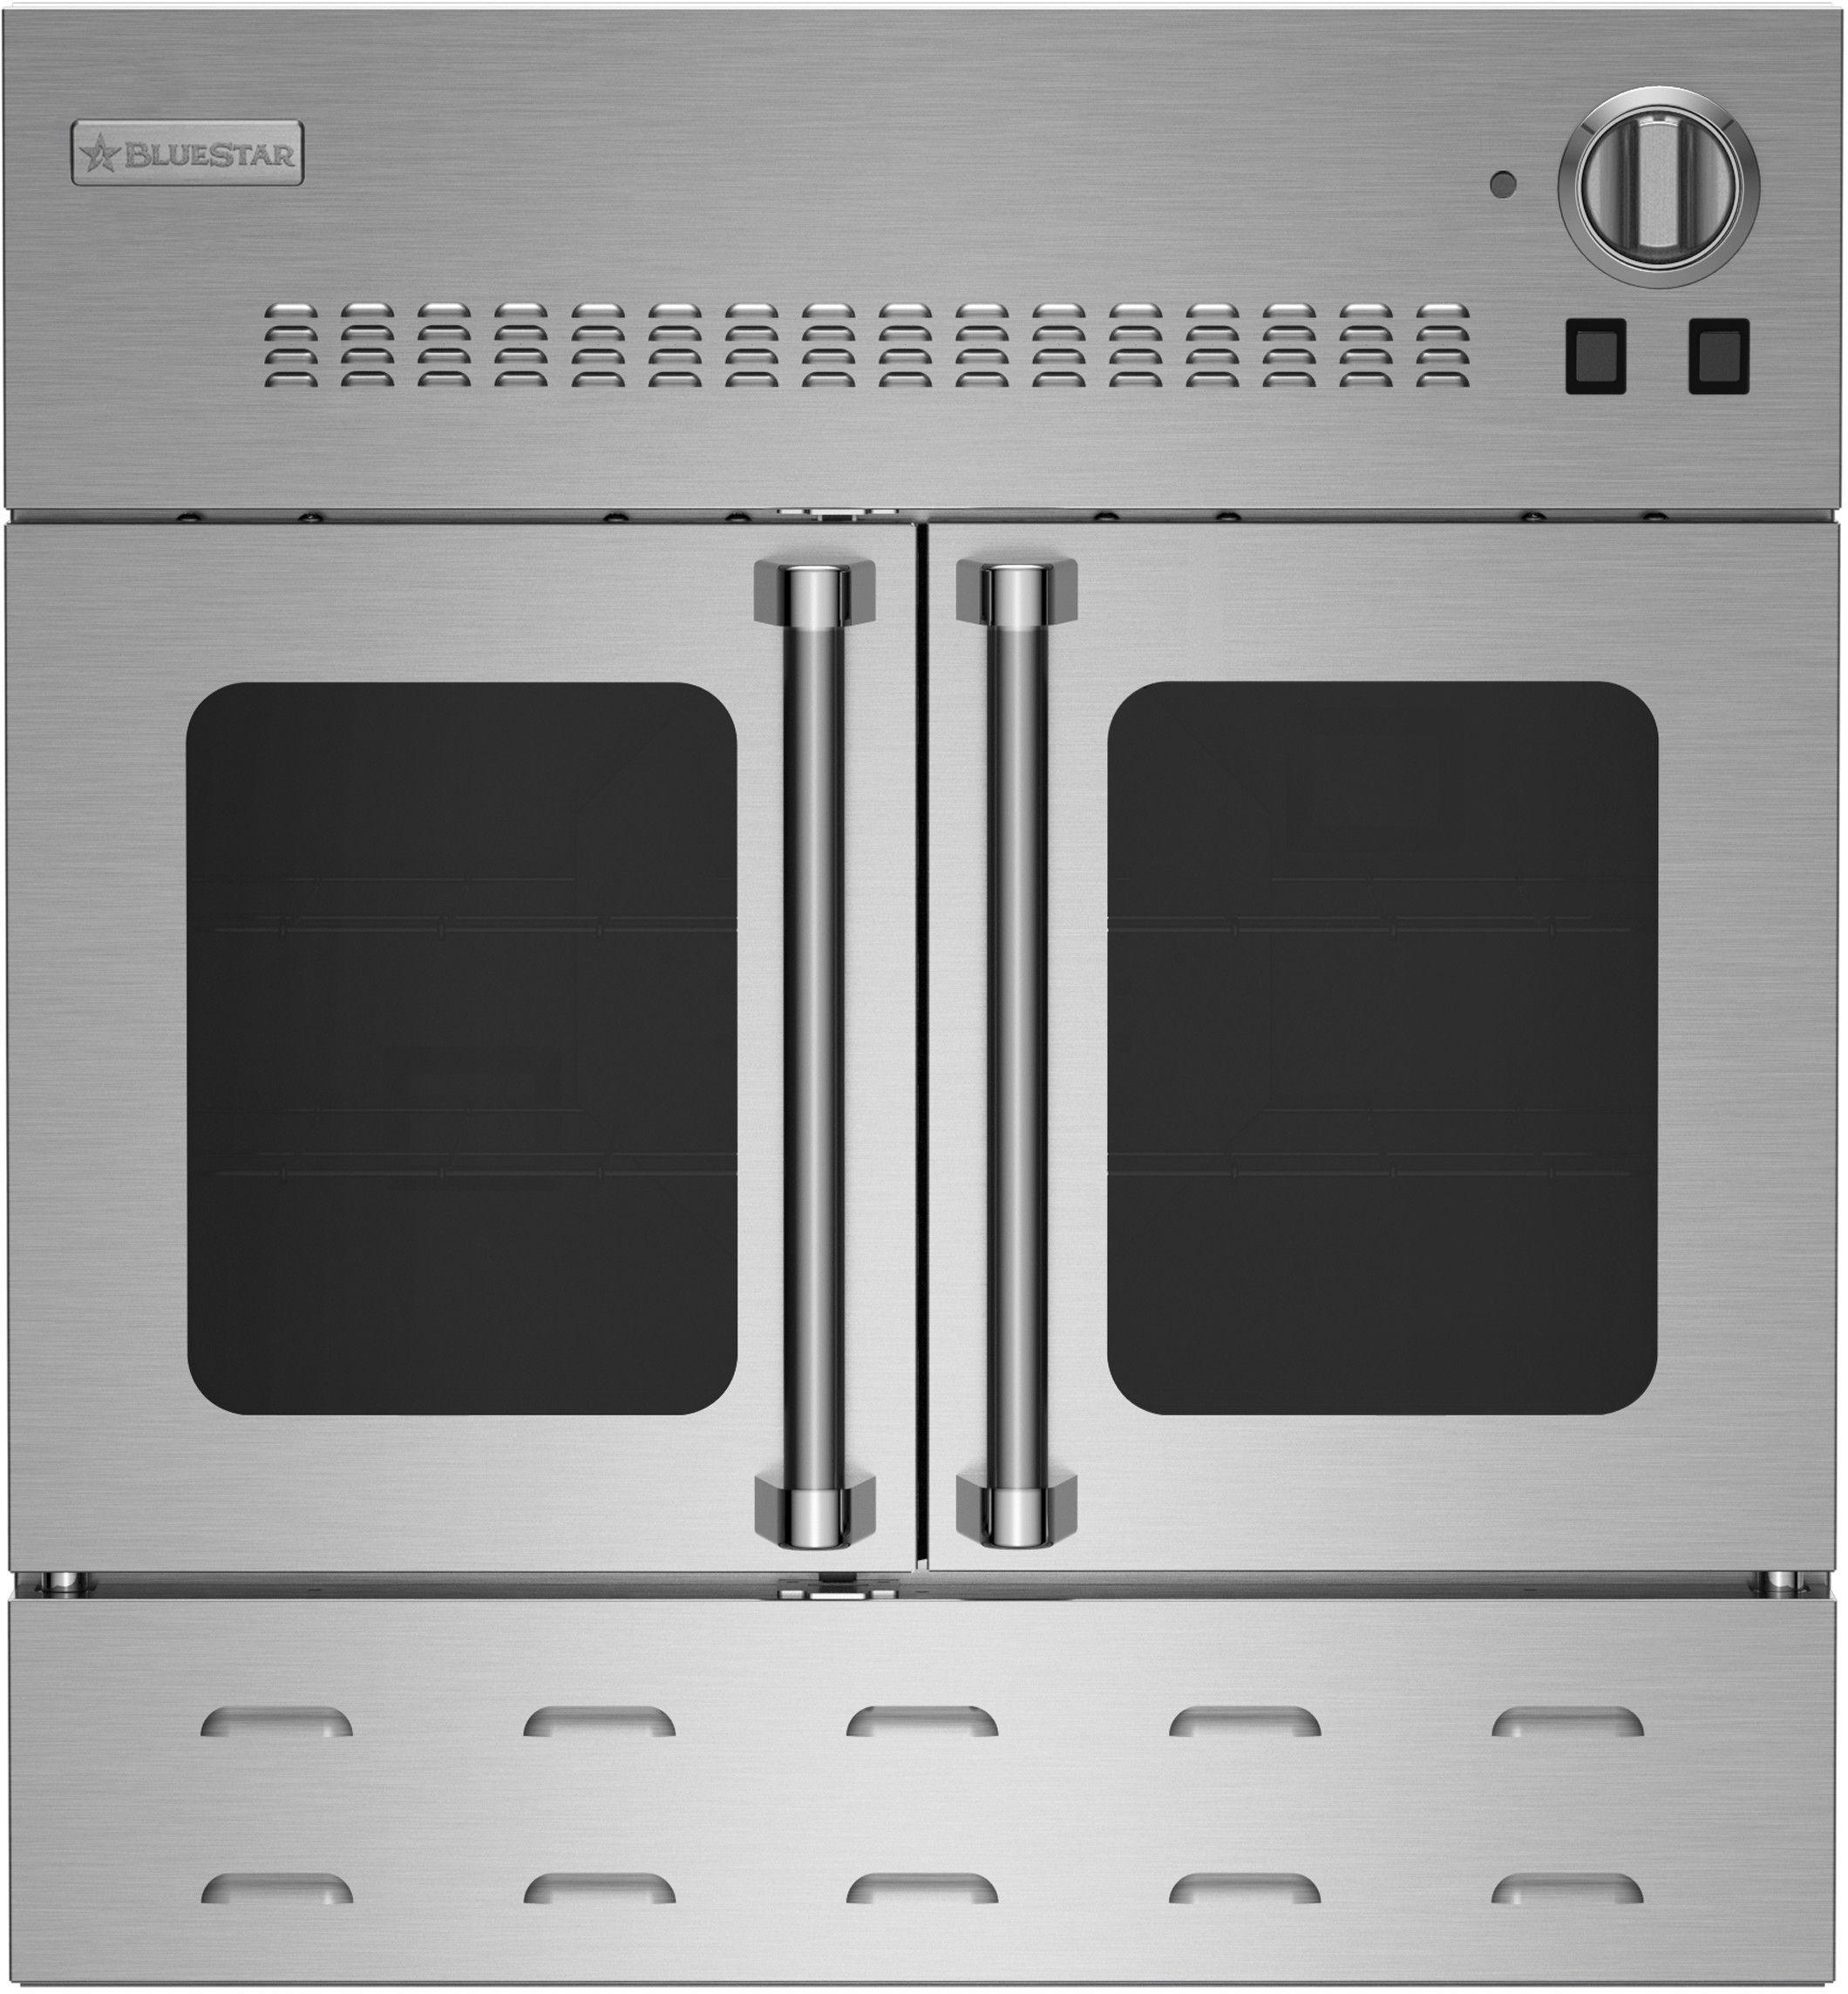 Bluestar 30 Single Gas Wall Oven Custom Colors Bwo30agsng In 2020 Gas Wall Oven Oven Racks Single French Door